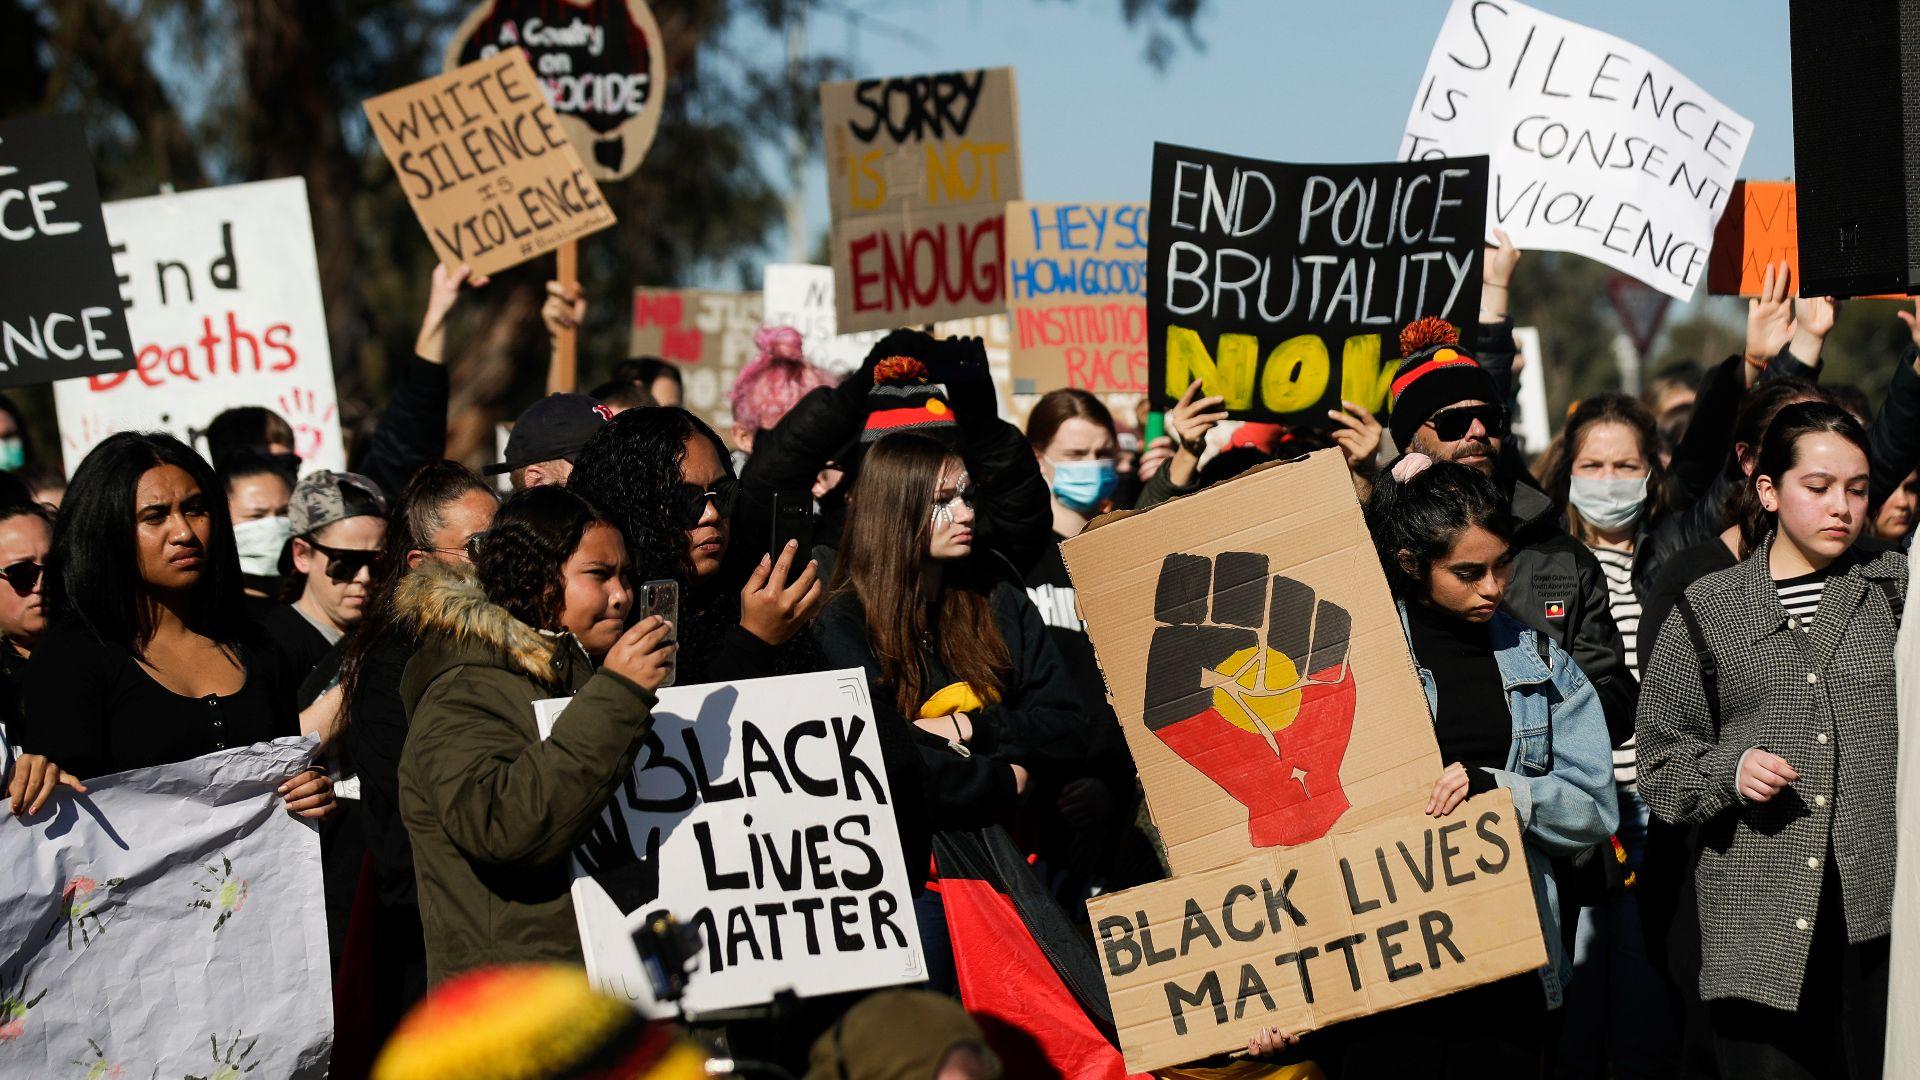 Black Lives Matter at Charles Sturt University